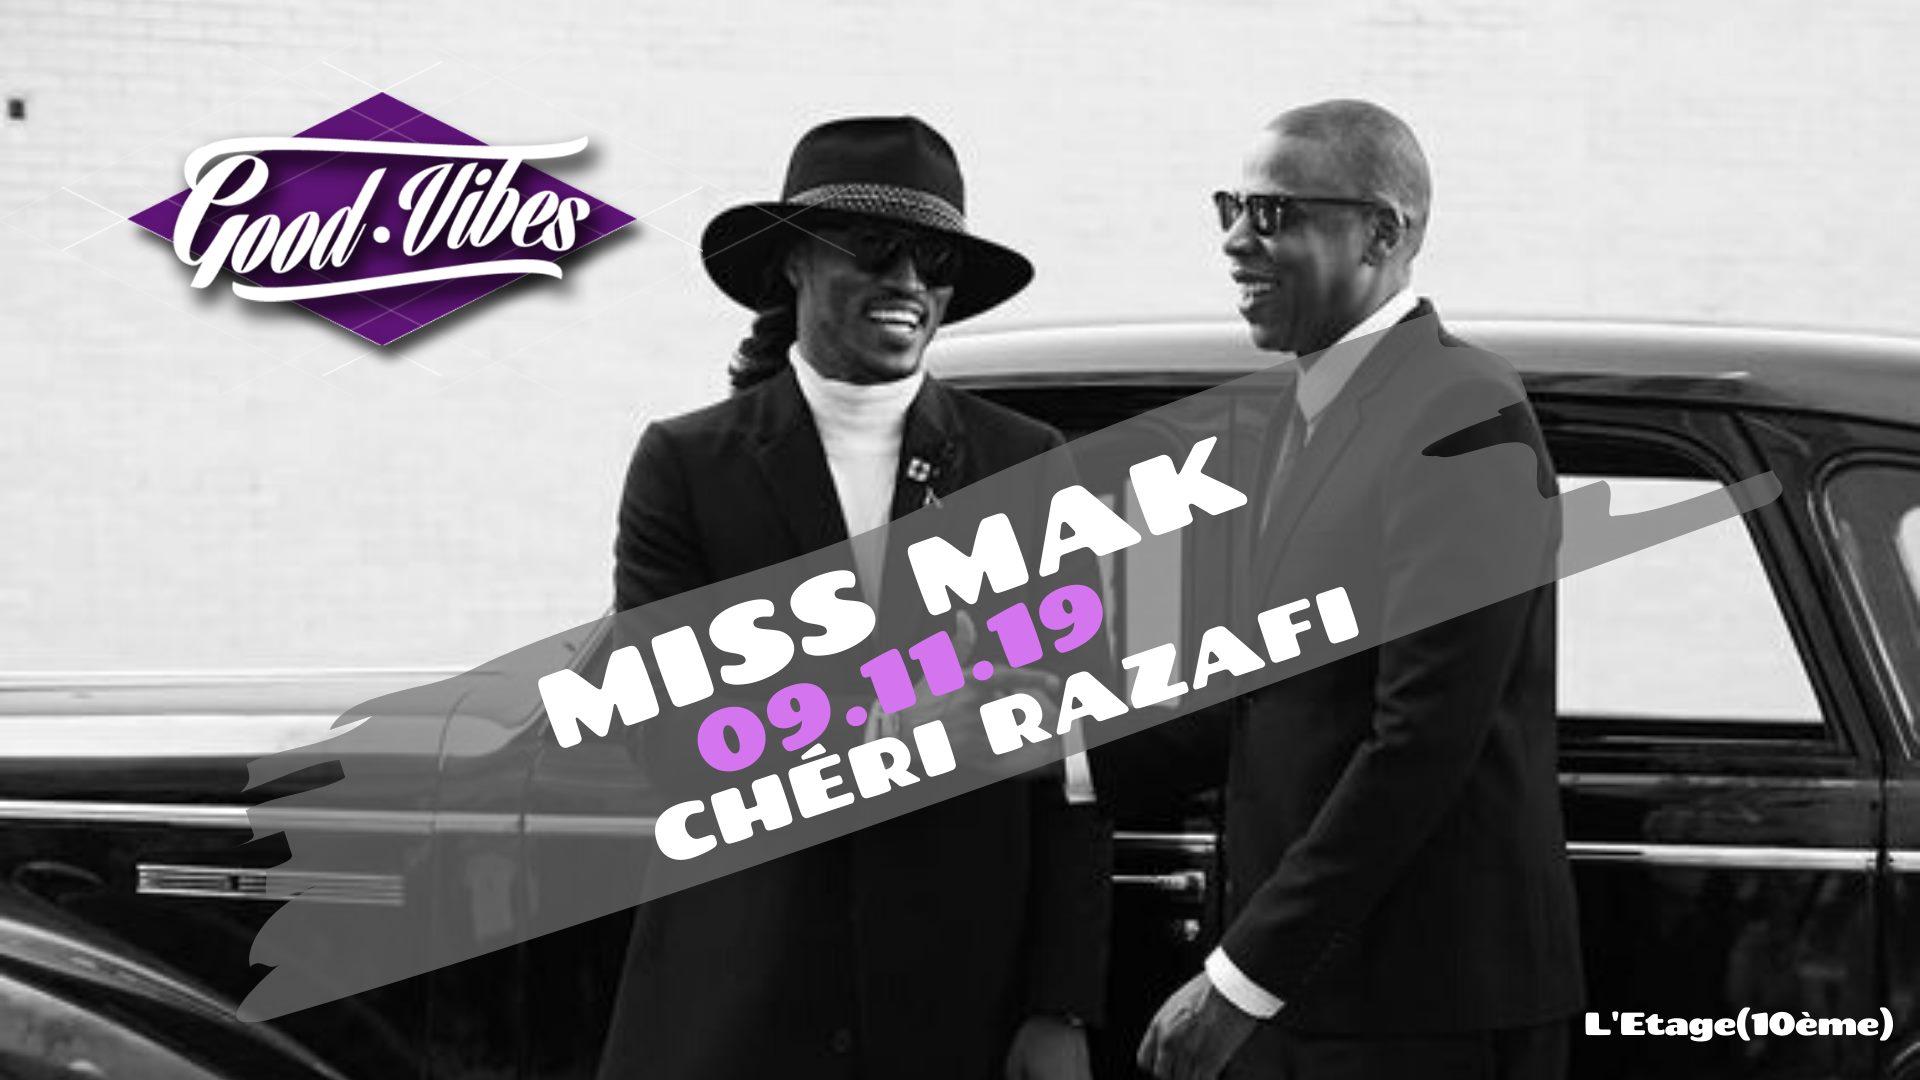 GOOD VIBES Miss Mak Chéri Razafi